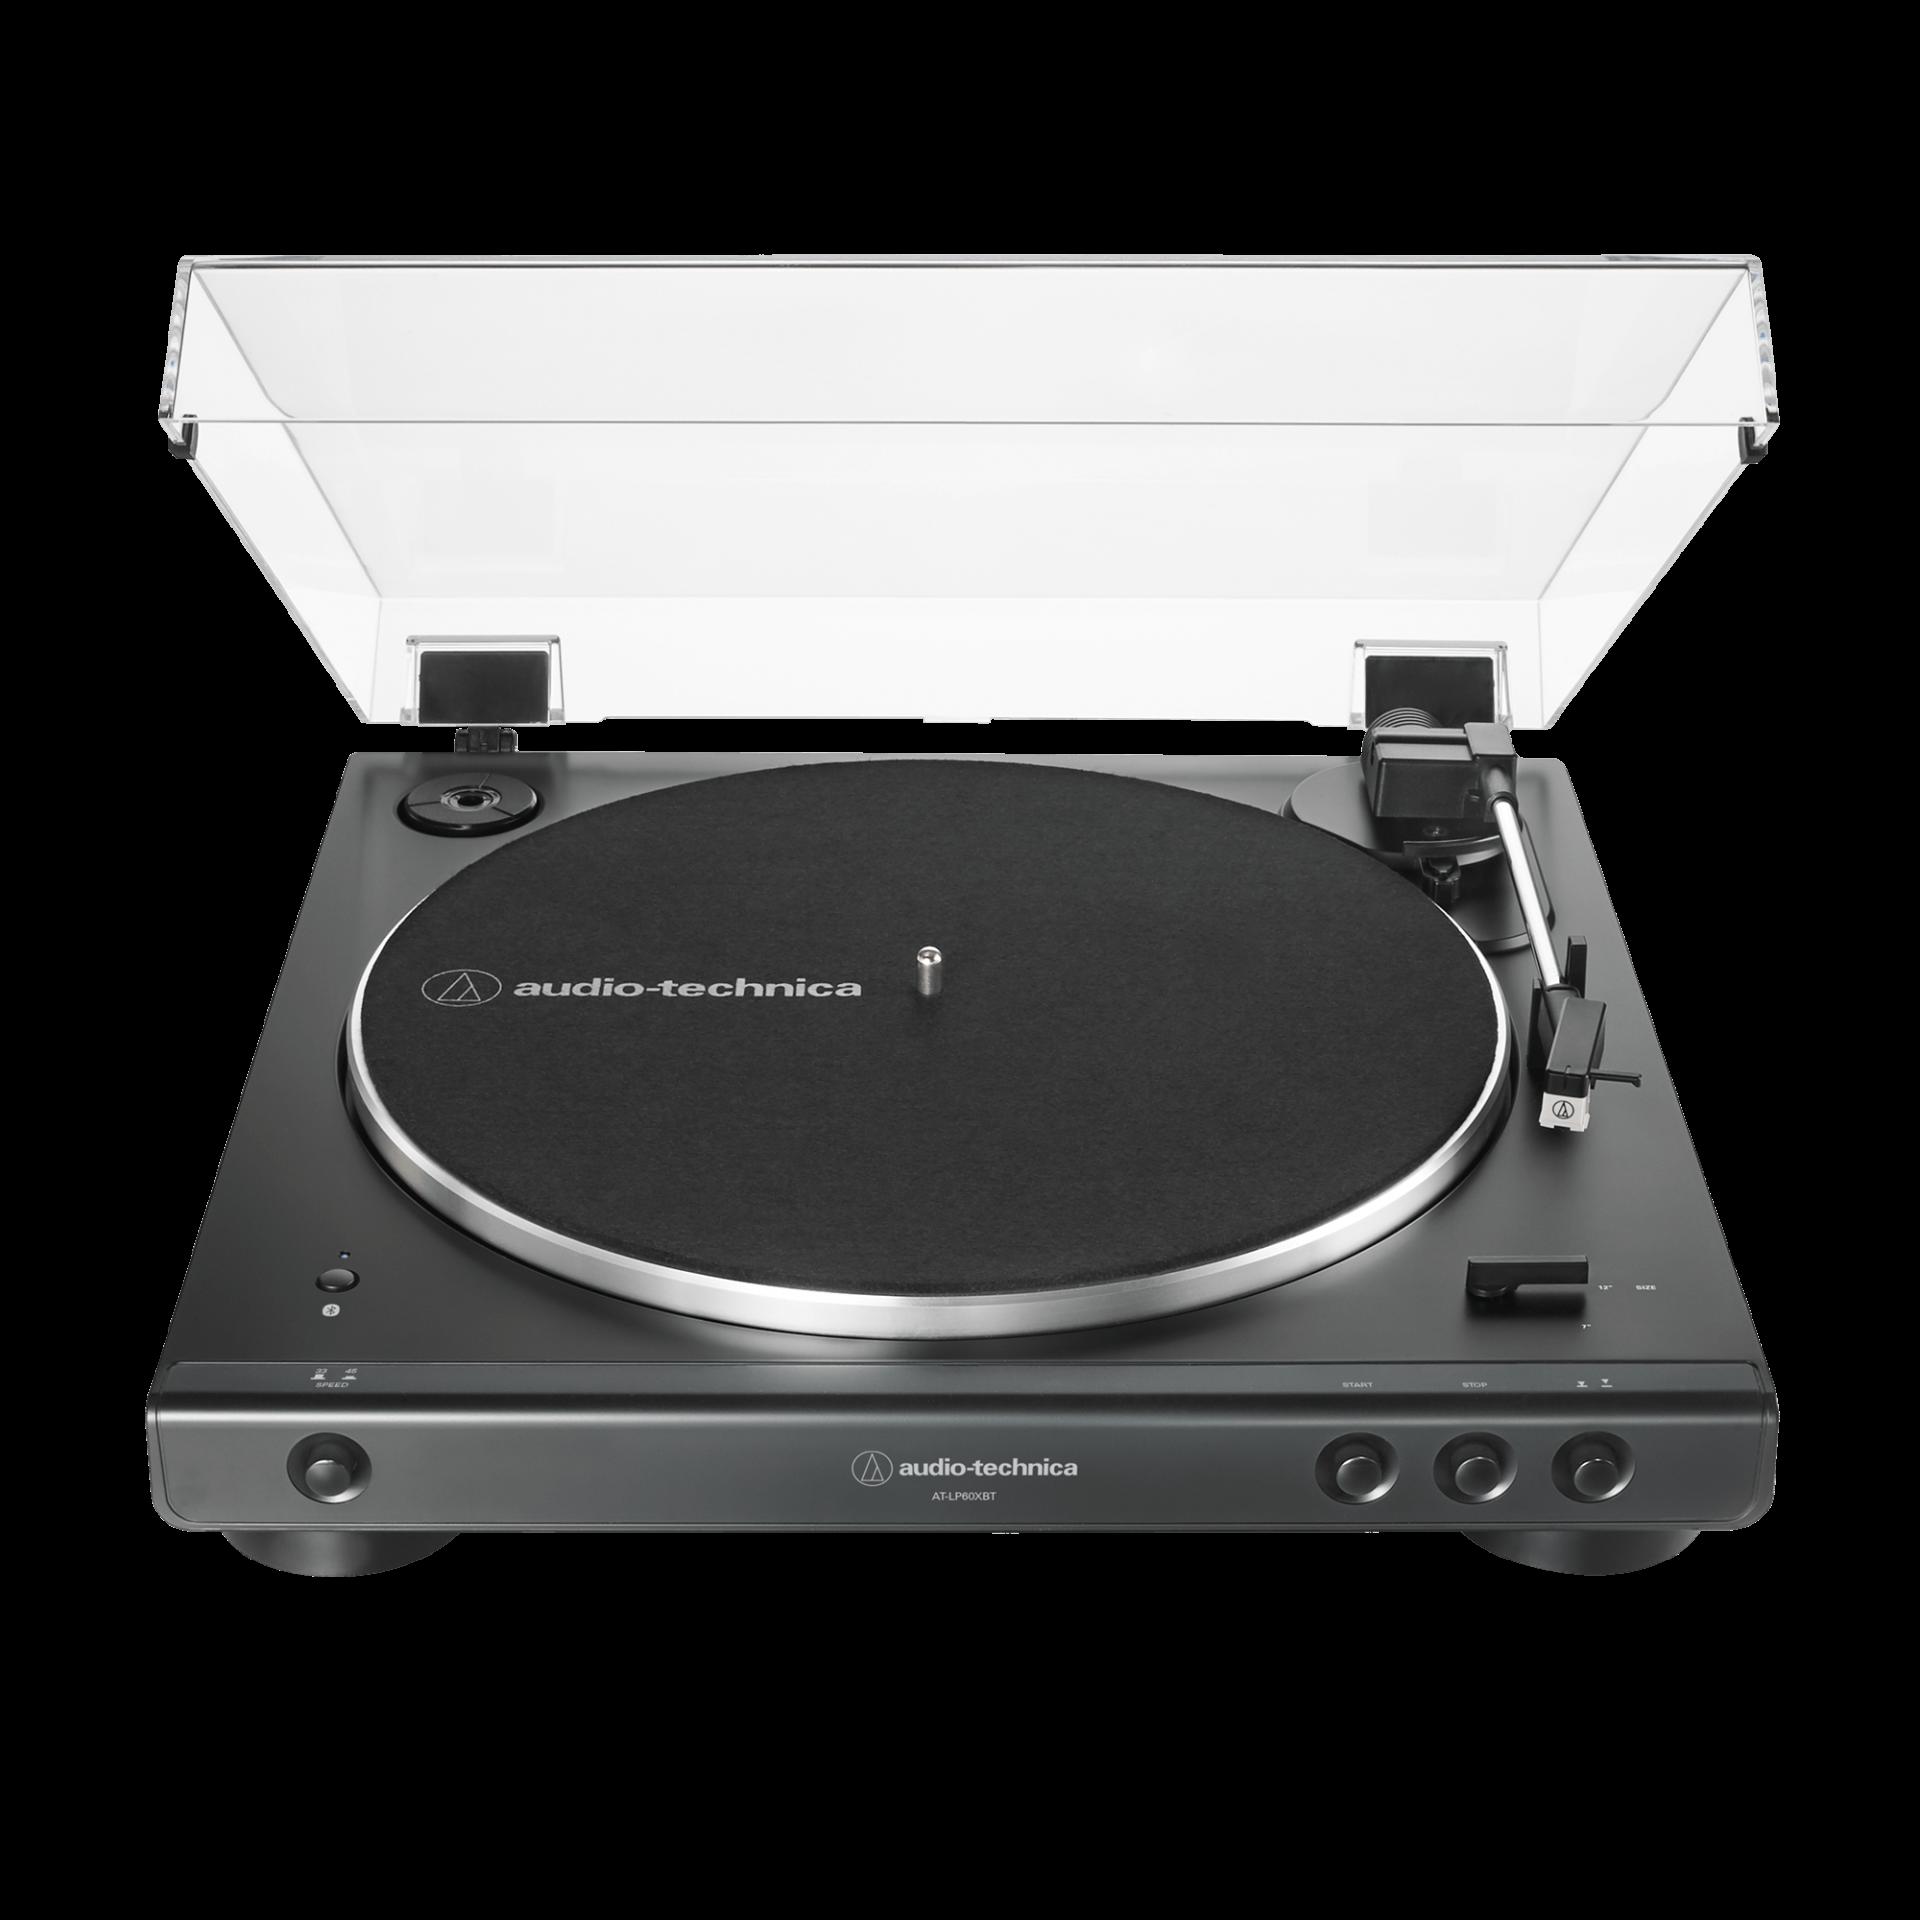 Audio Technica AT-LP60XBT-USB turntable